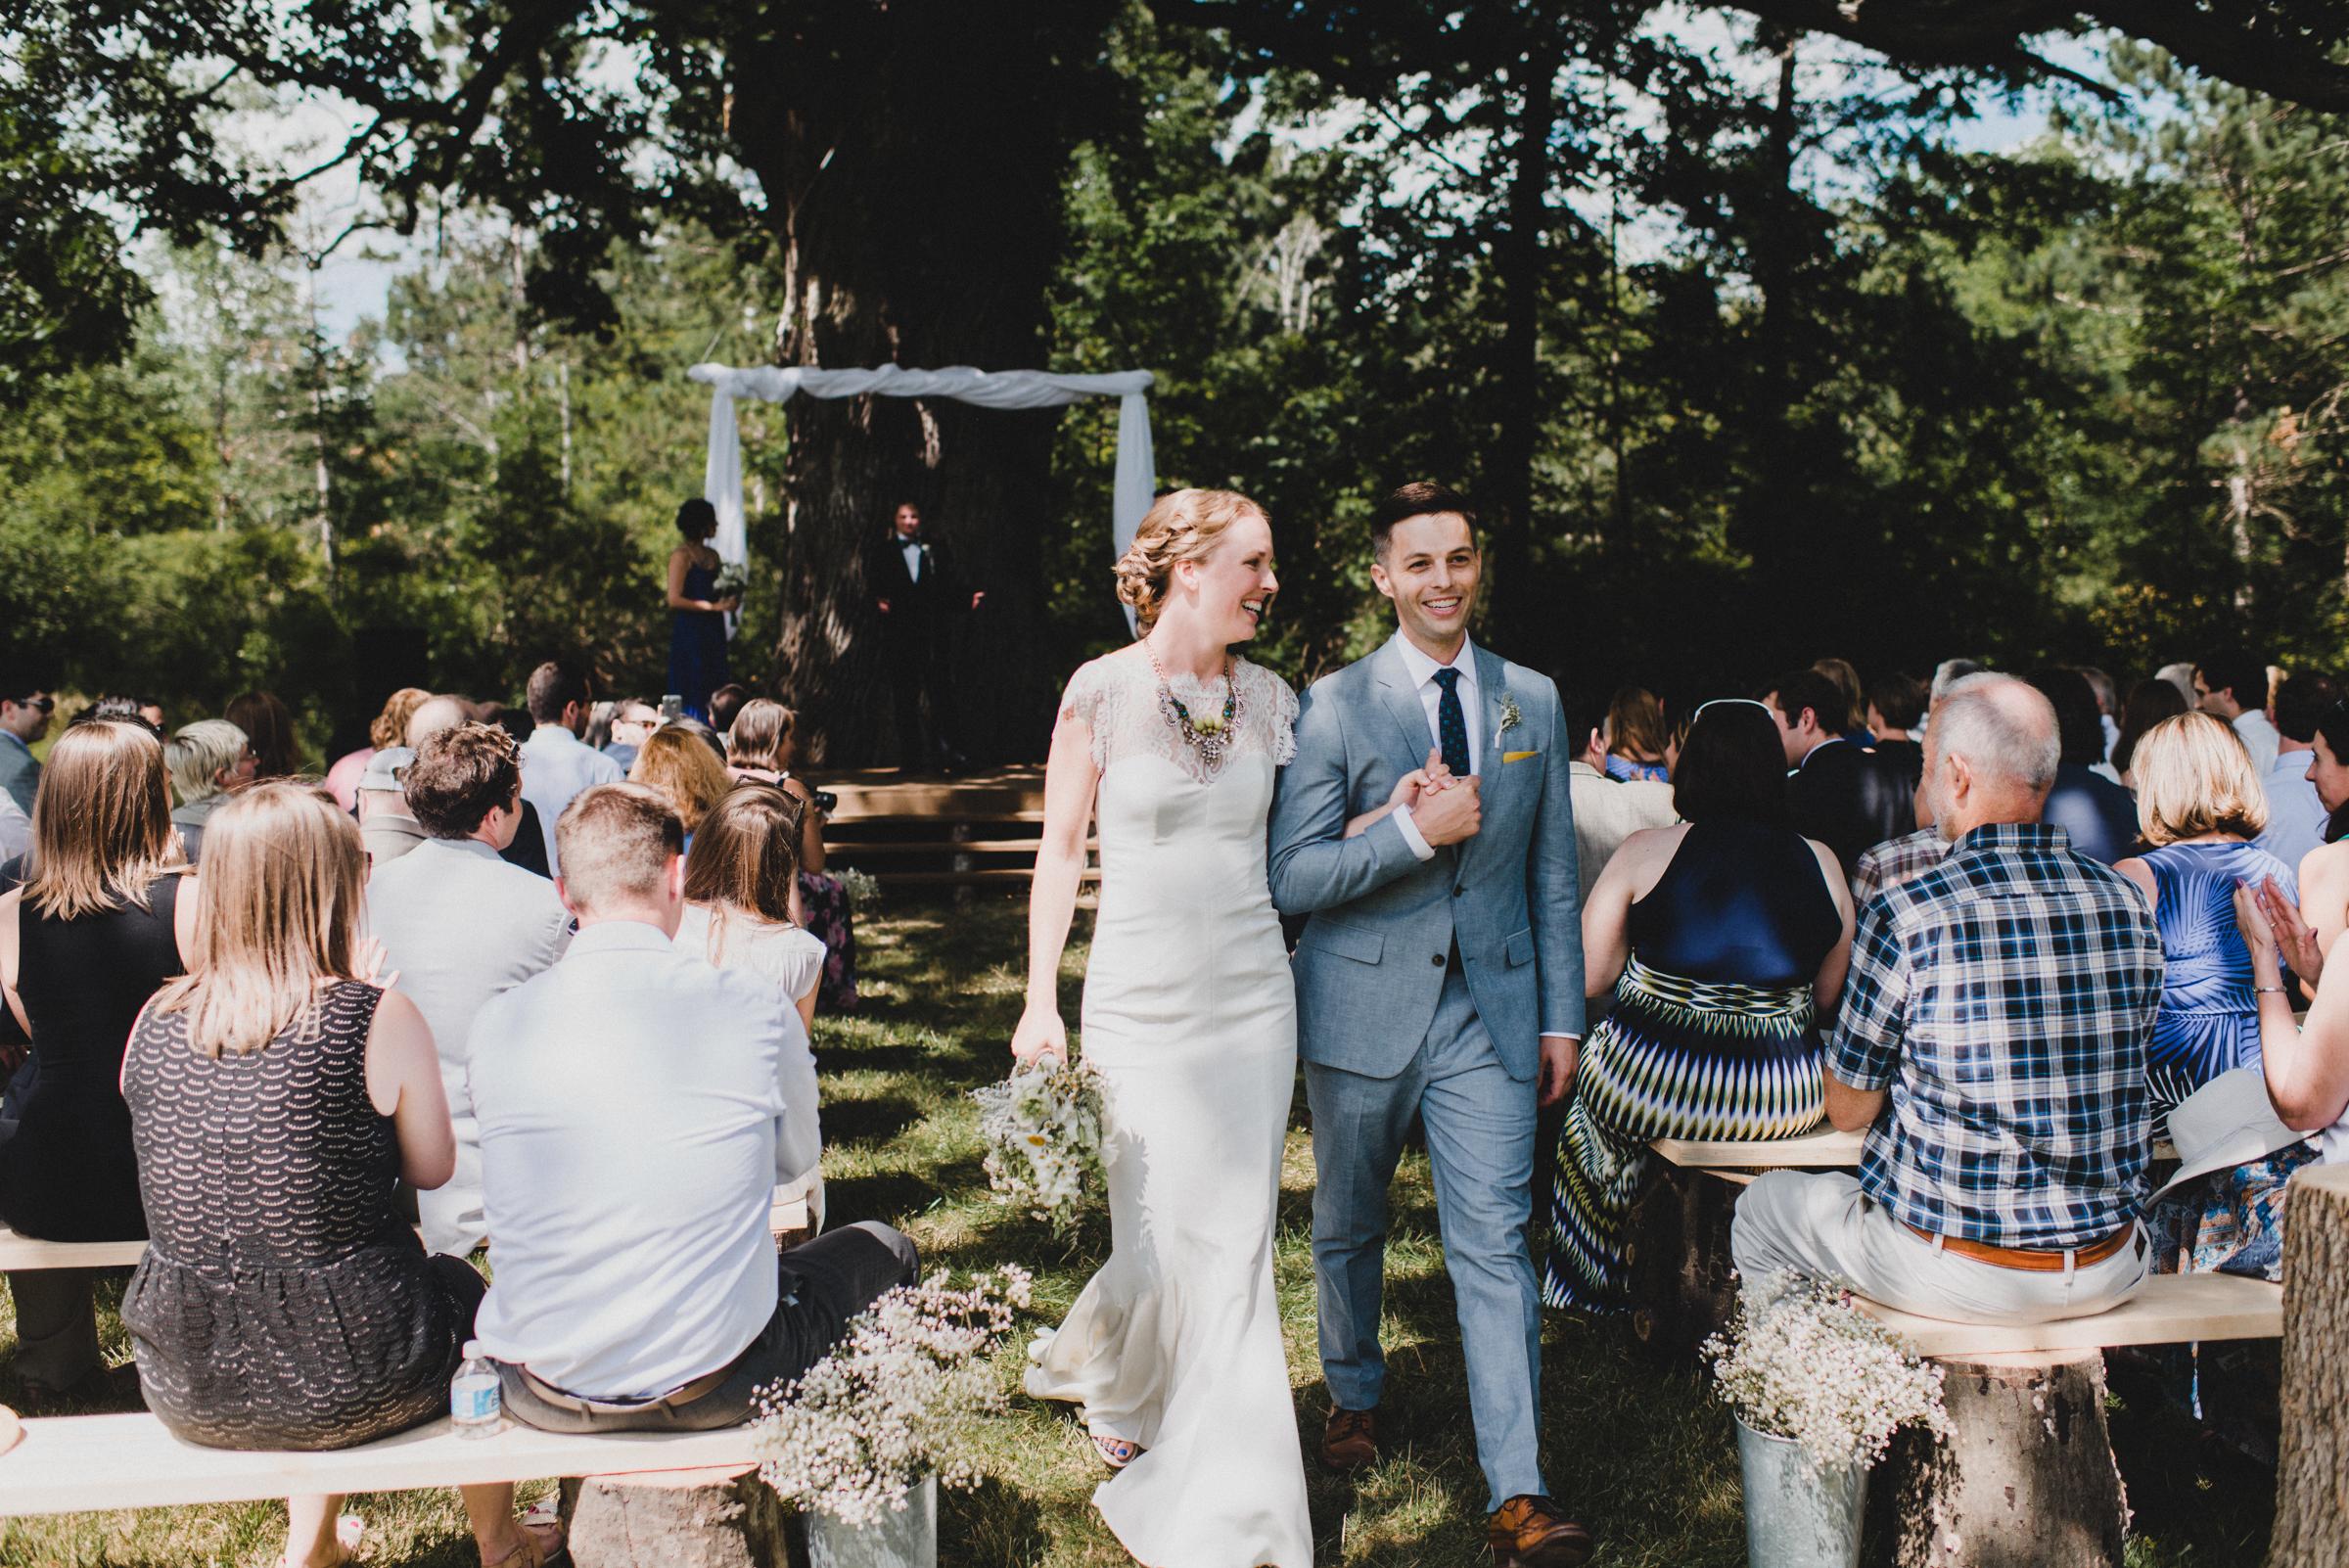 Intimate-Backyard-Farmhouse-Ohio-Wedding-Andi+Ben_Mallory+Justin-Photographers-172.JPG